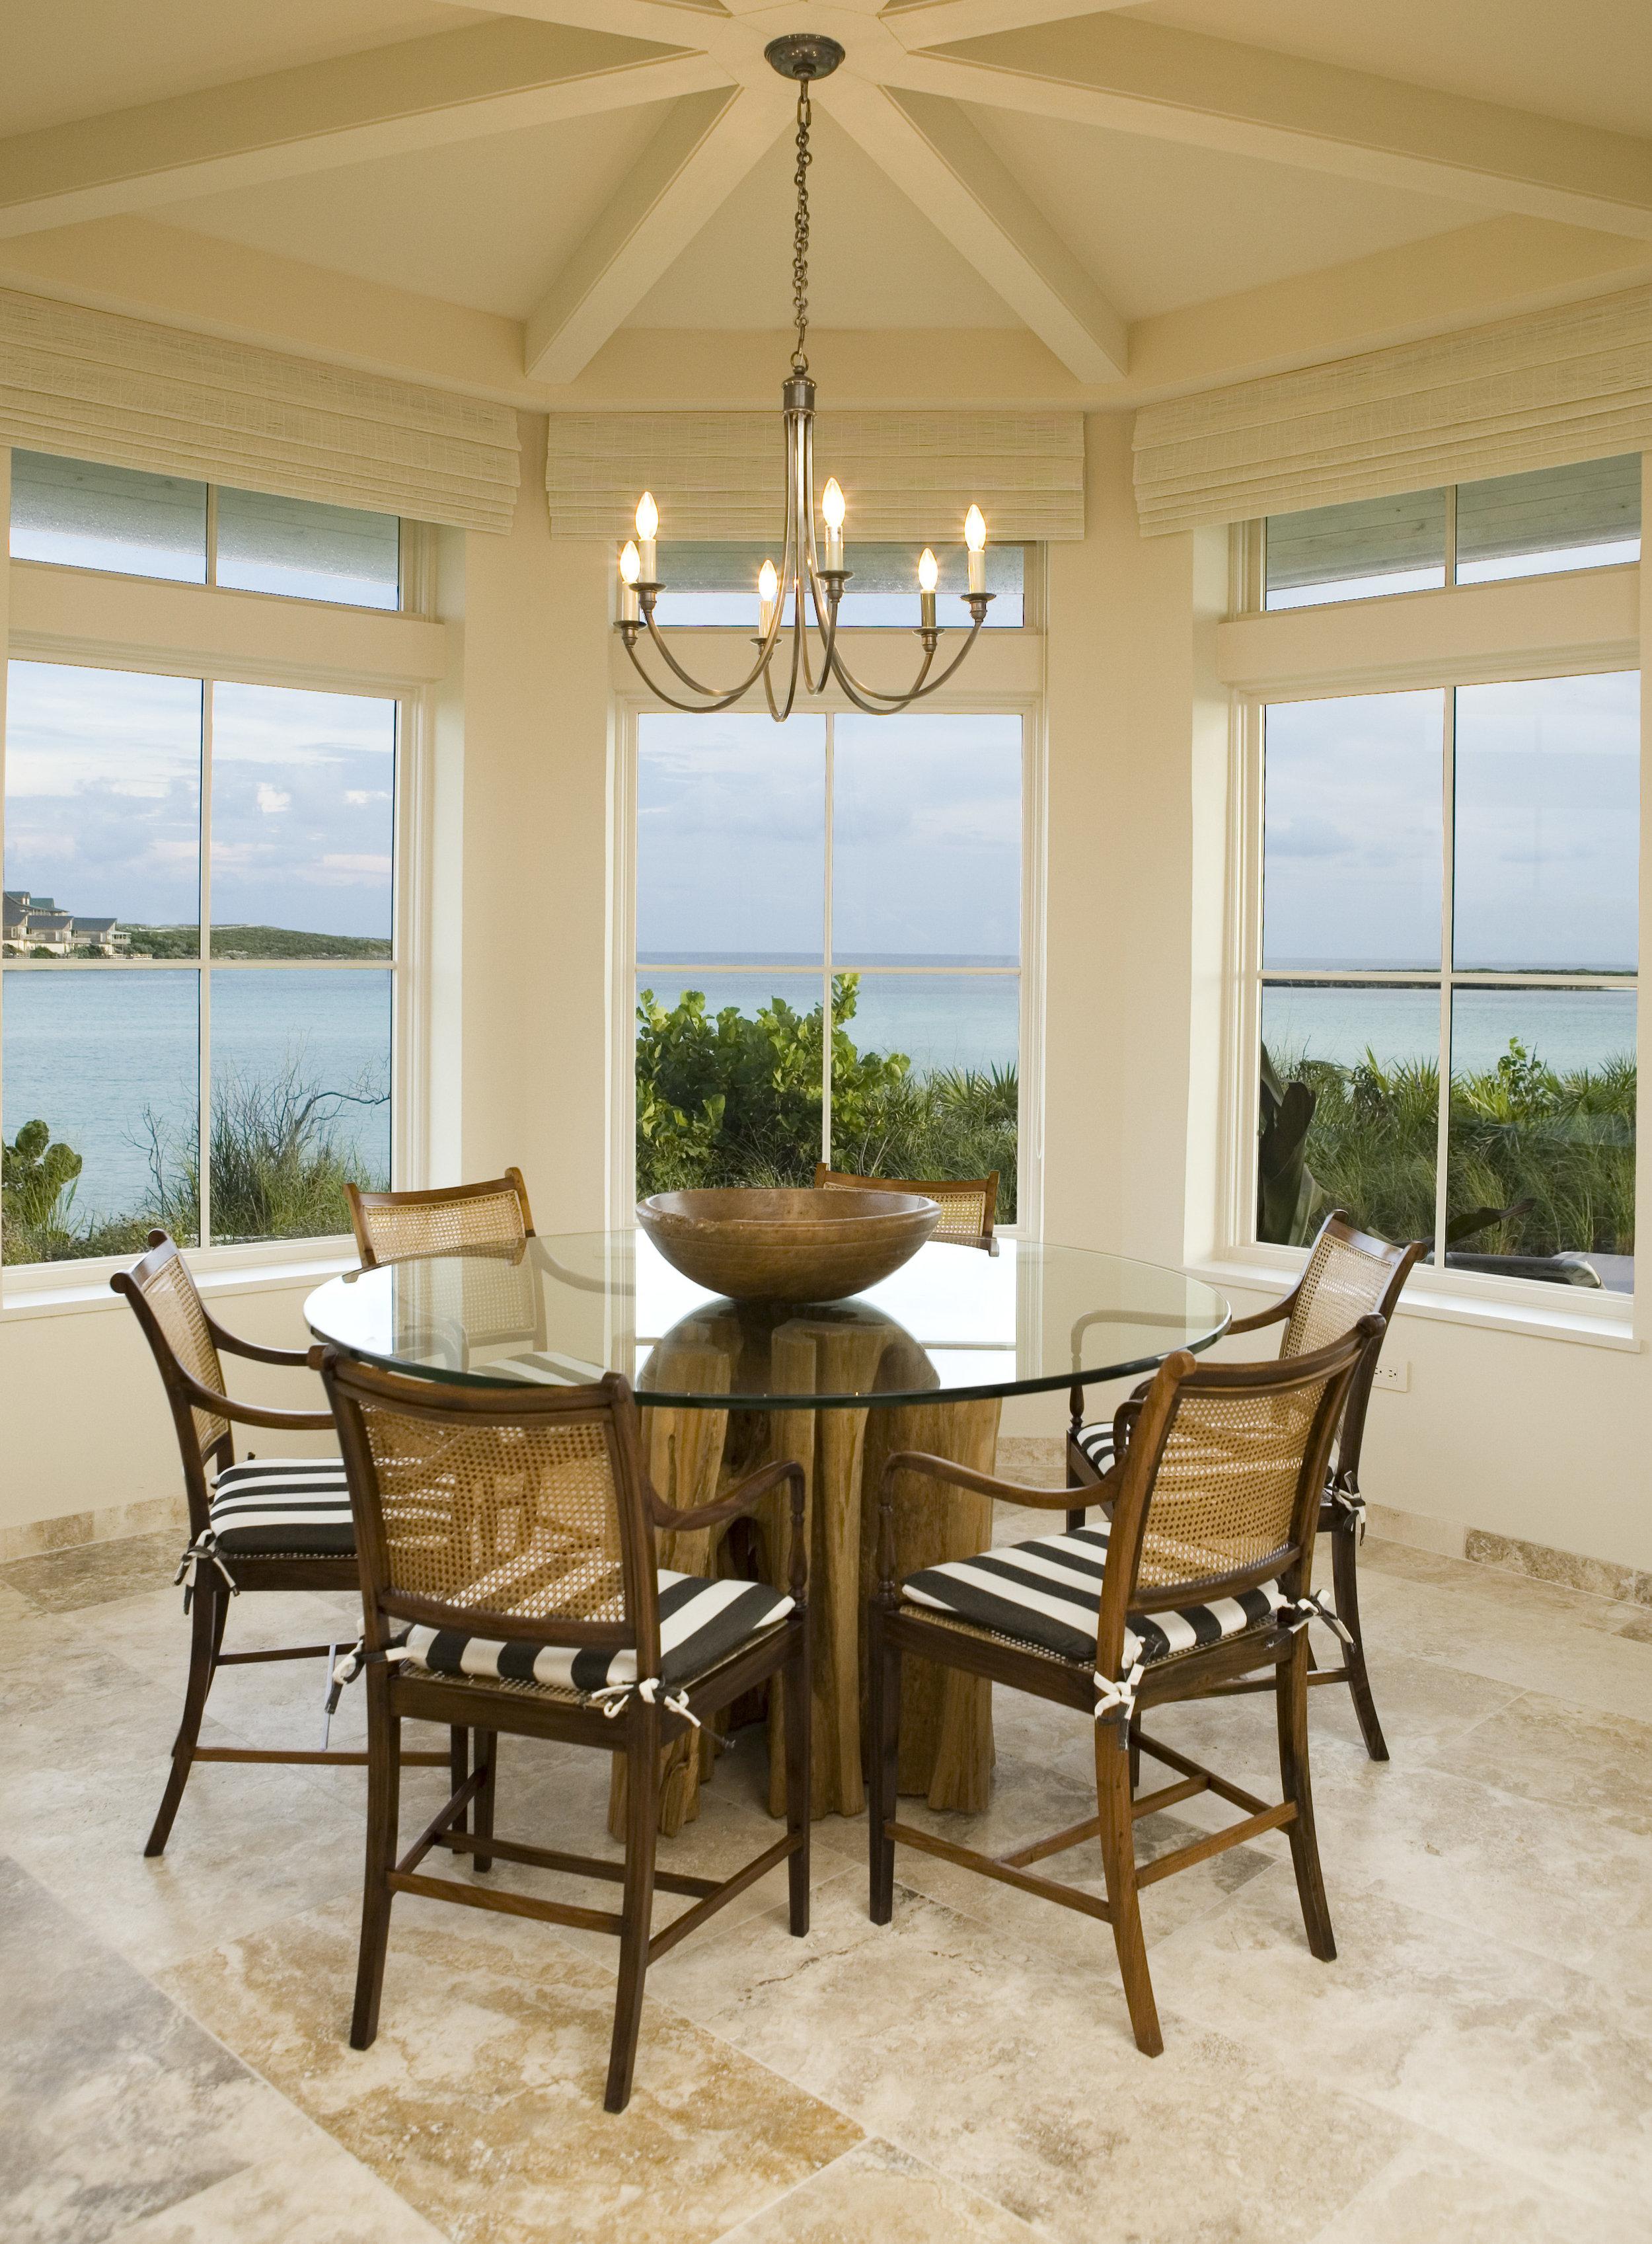 Beachfront Estate Breakfast Nook by HDS Architecture